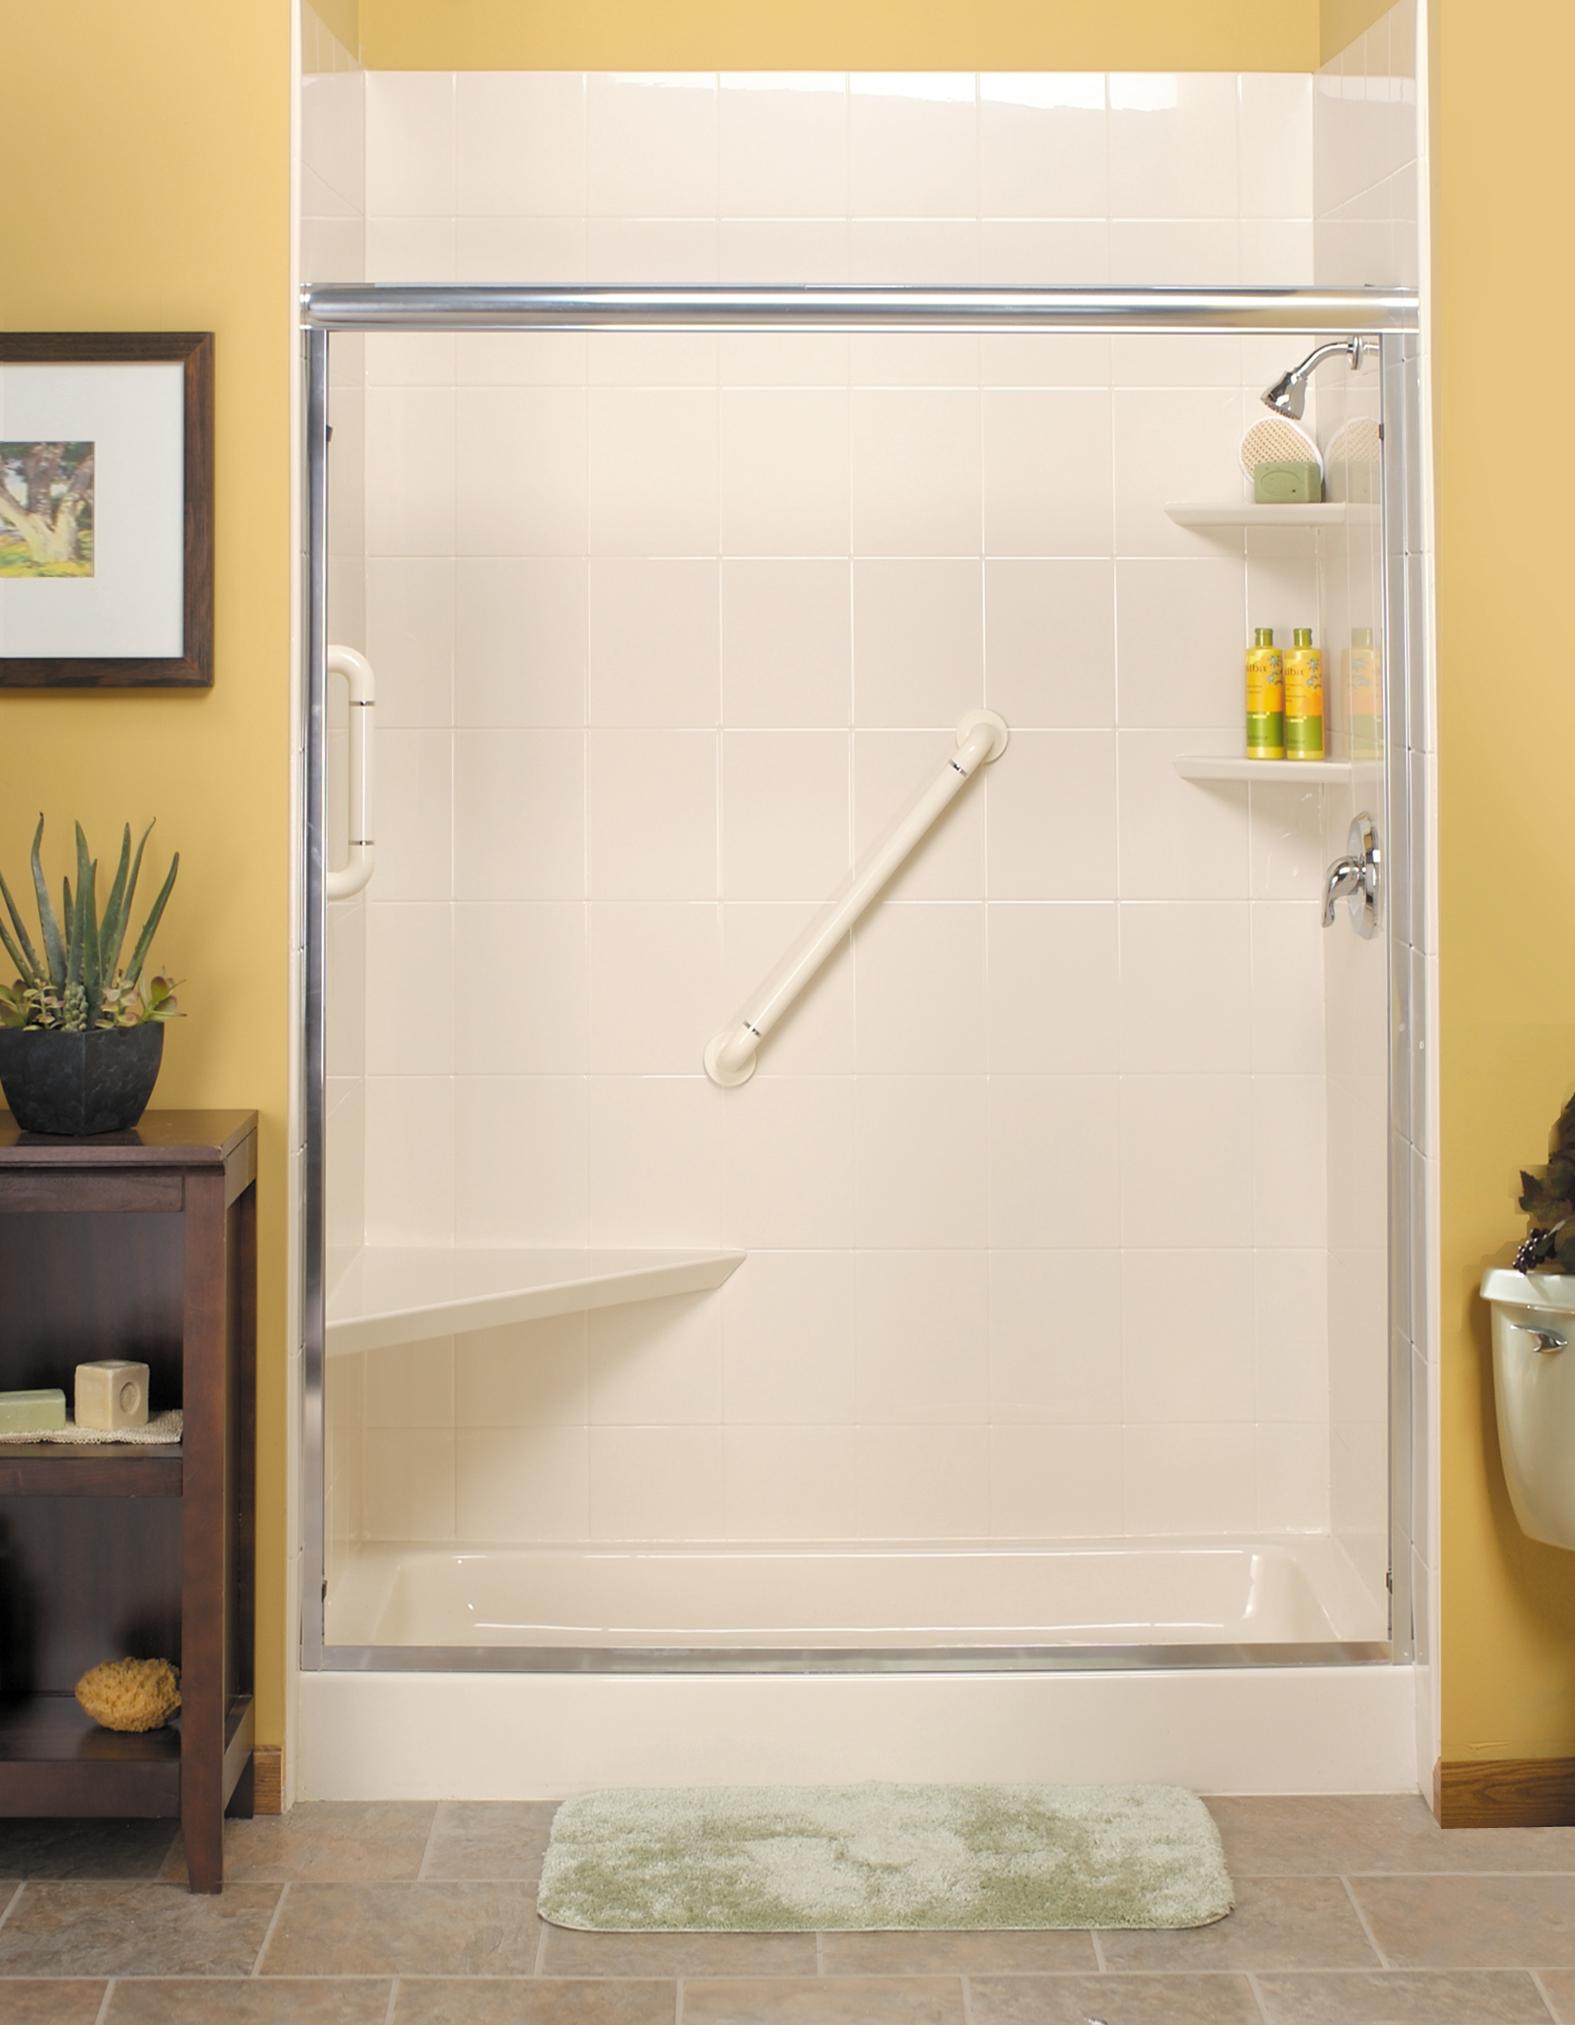 Deep shower base by Brad B&B Reglazing, Goderich